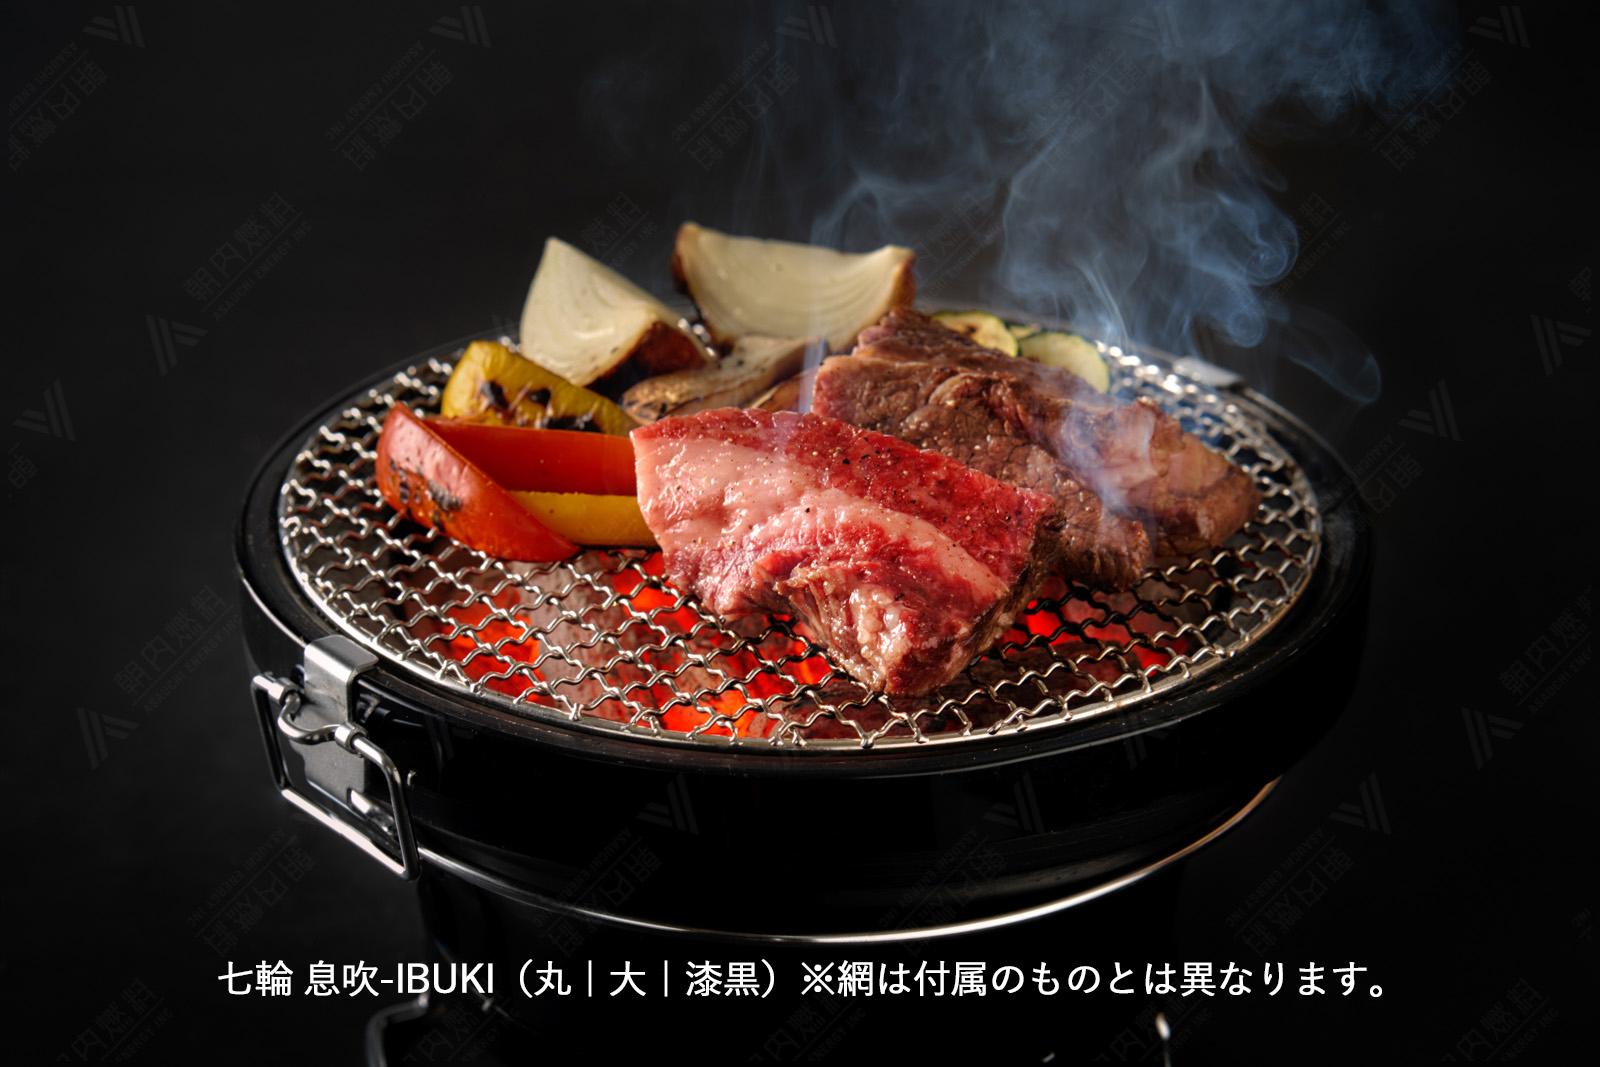 炭火焼き七輪L(~4人)